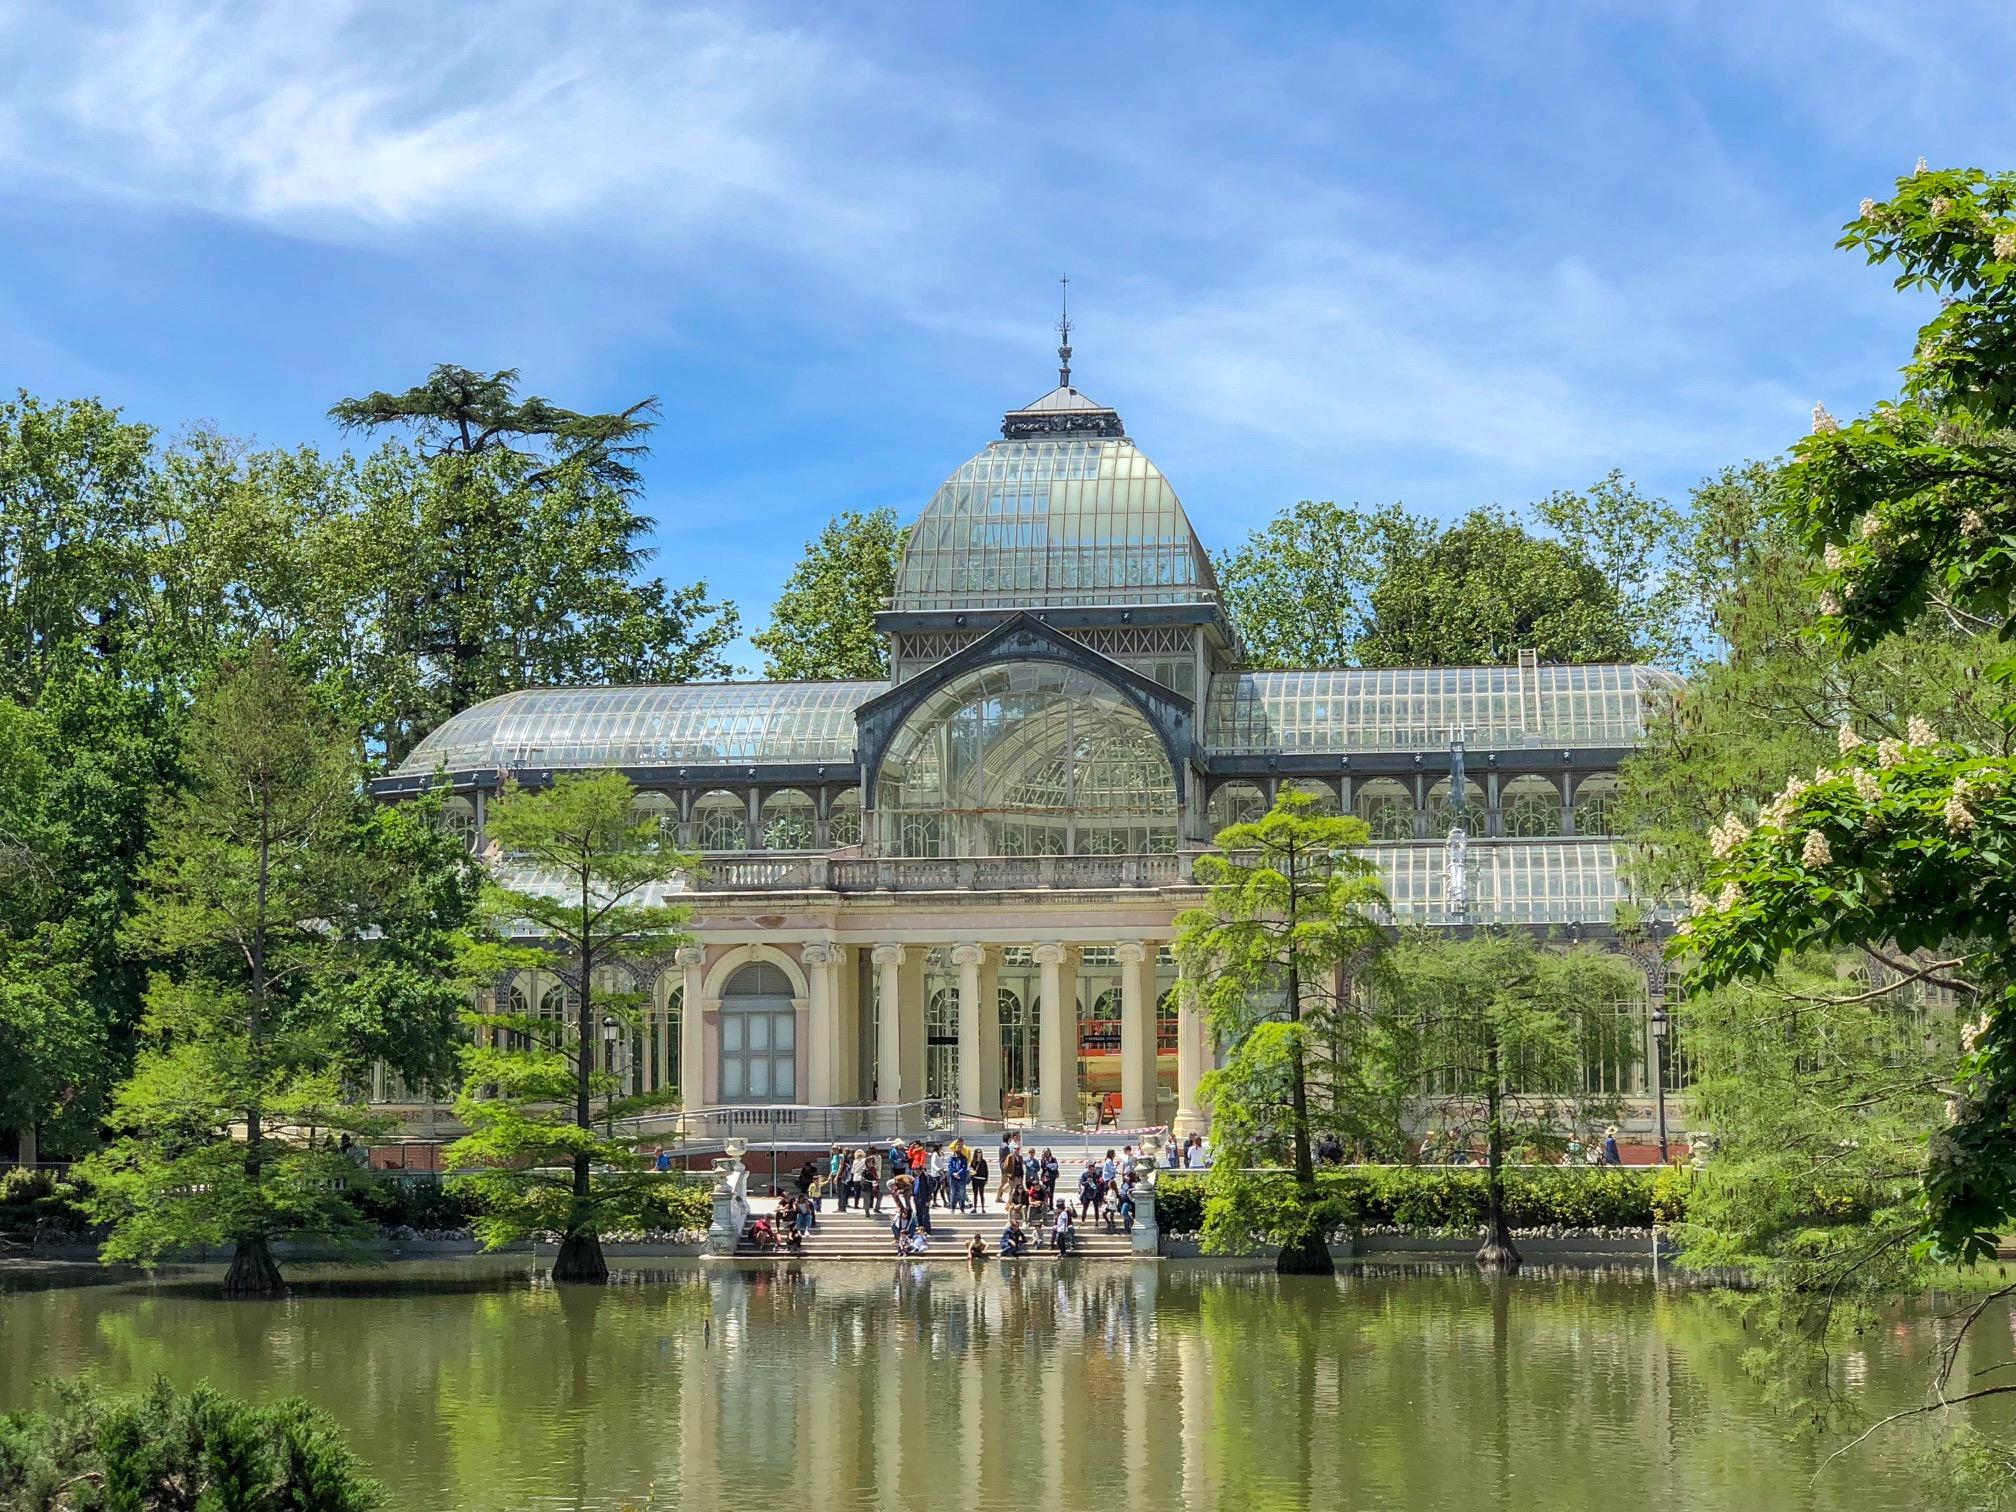 palacio de cristal - madrid spain - el retiro park